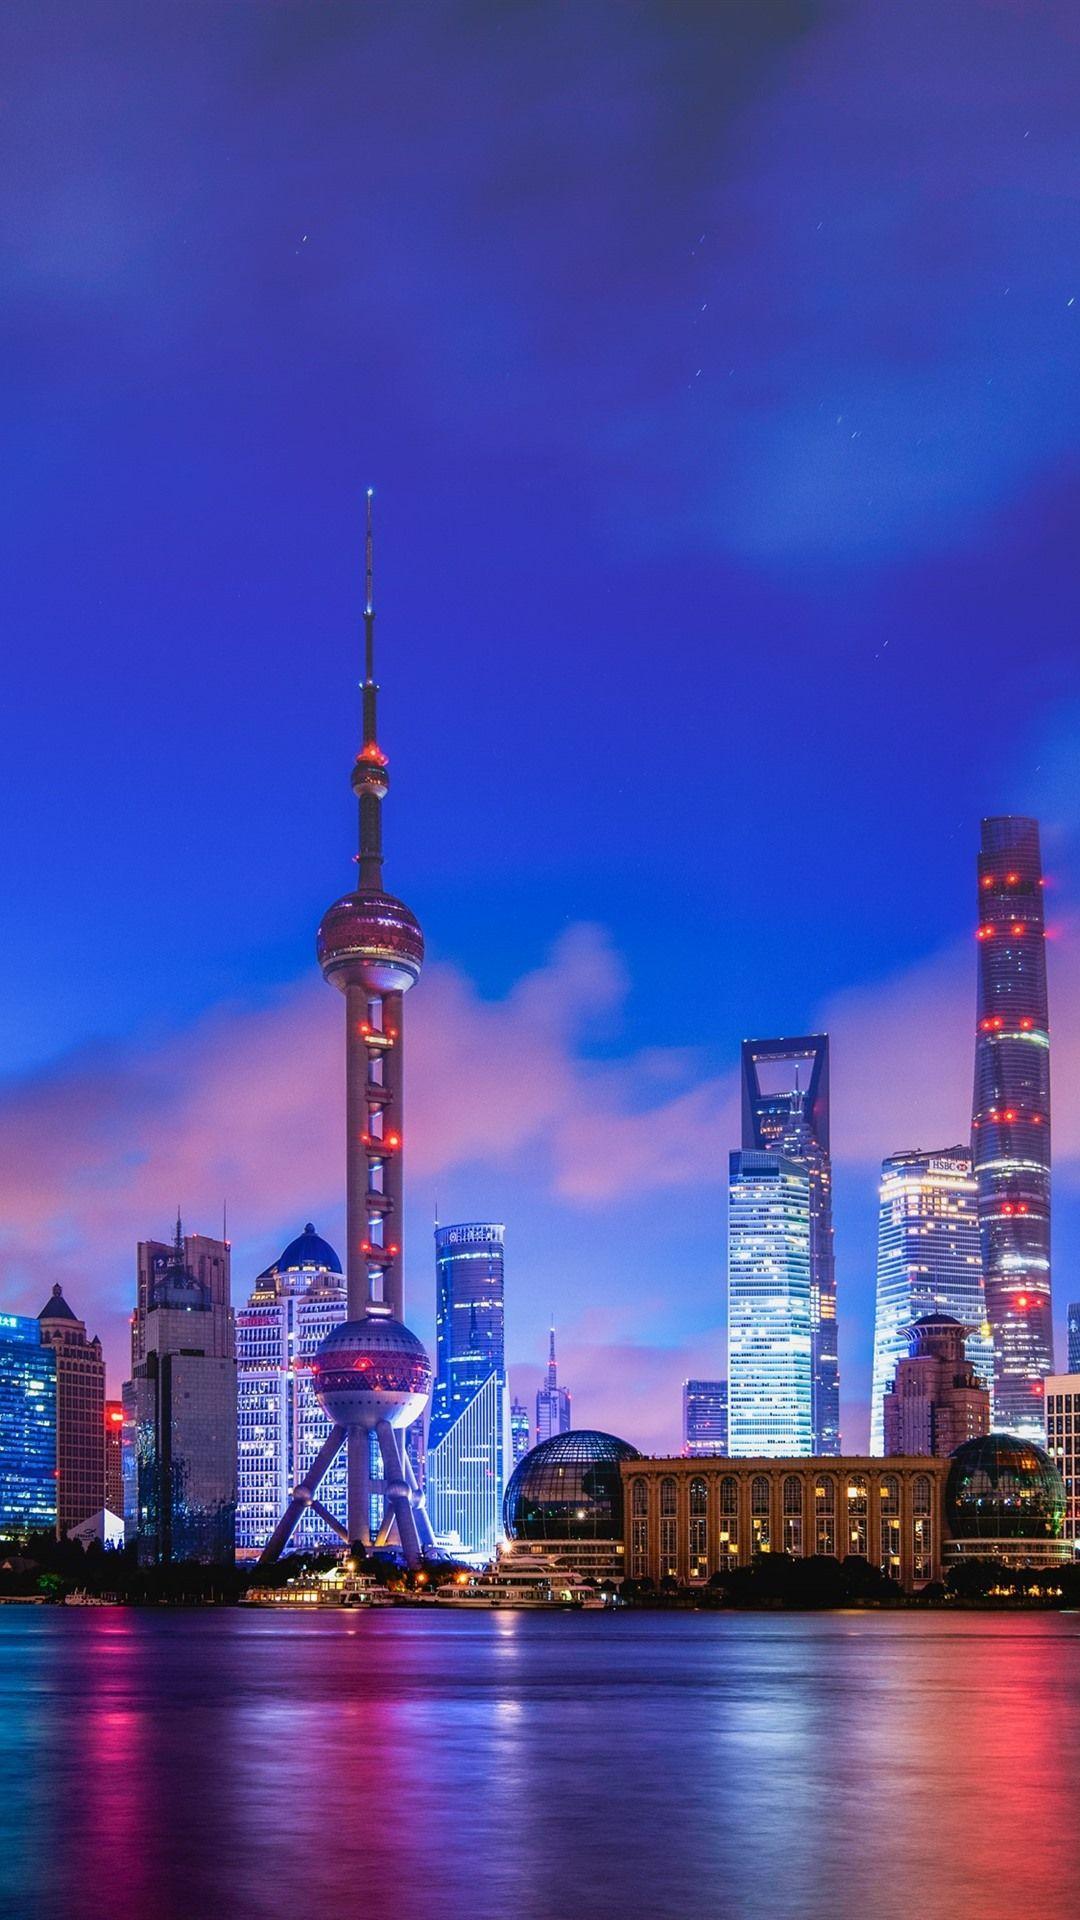 Shanghai iPhone Wallpapers - Top Free